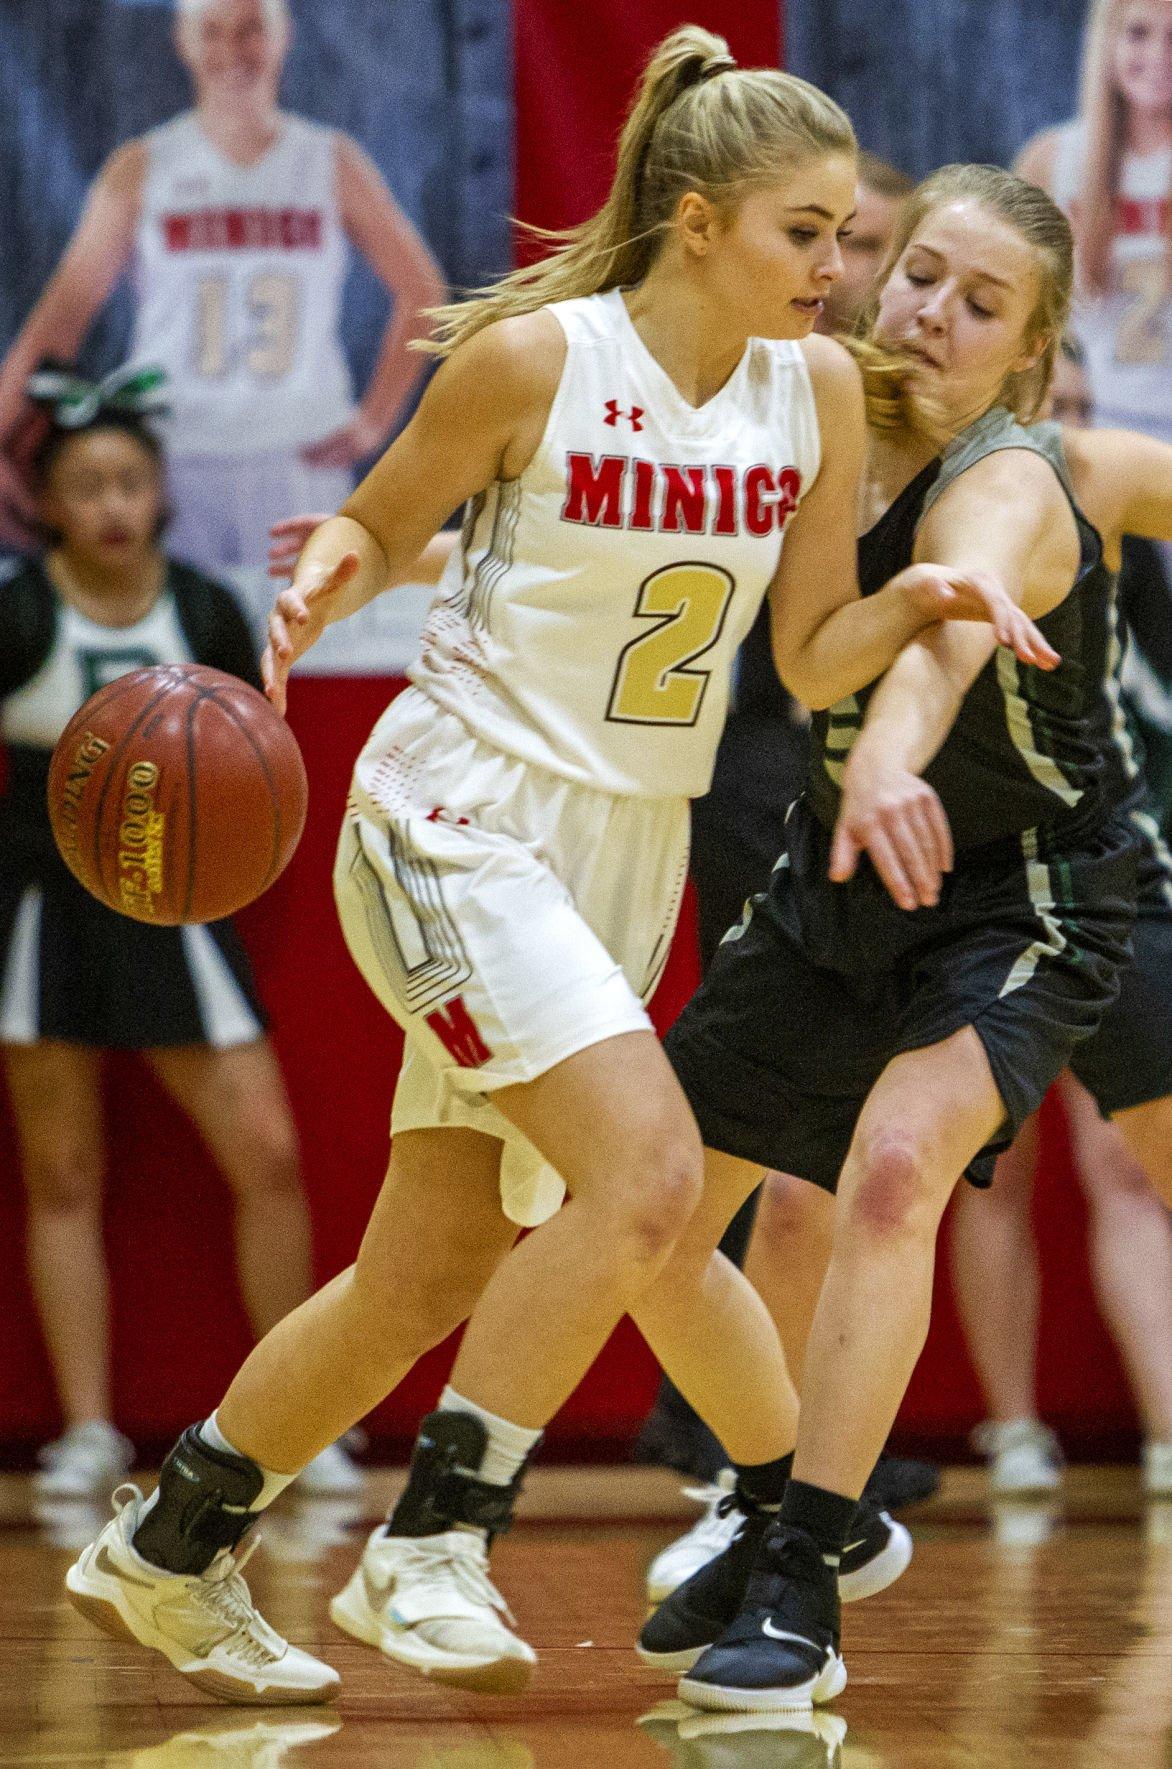 Minico vs Burley girls basketball